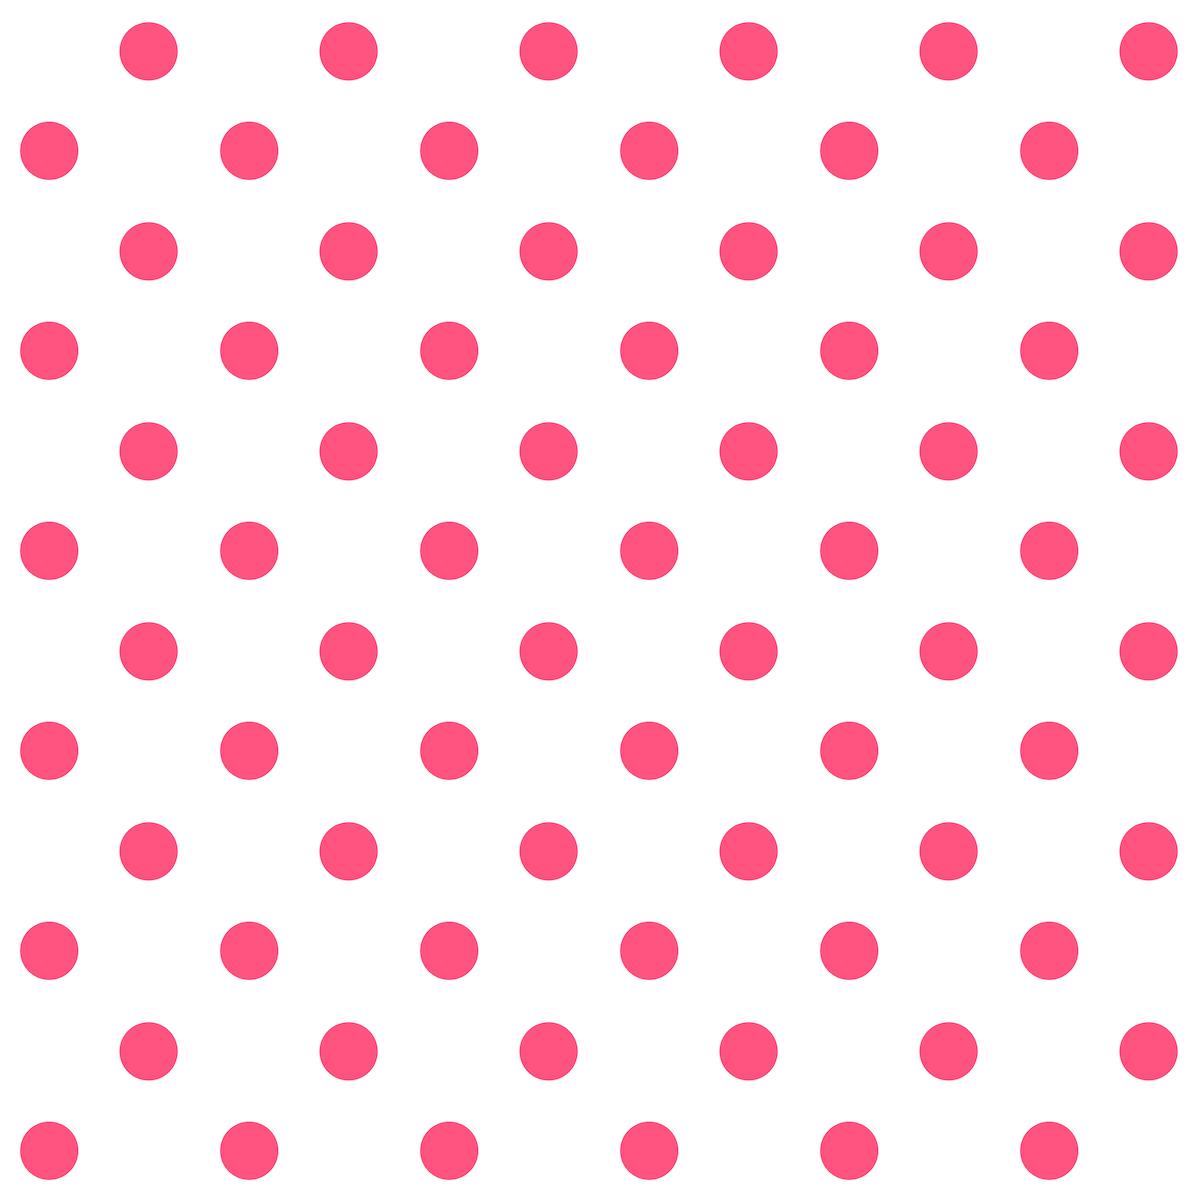 Baby Animal Wall Stickers Free Digital Polka Dot Scrapbooking Papers Ausdruckbare